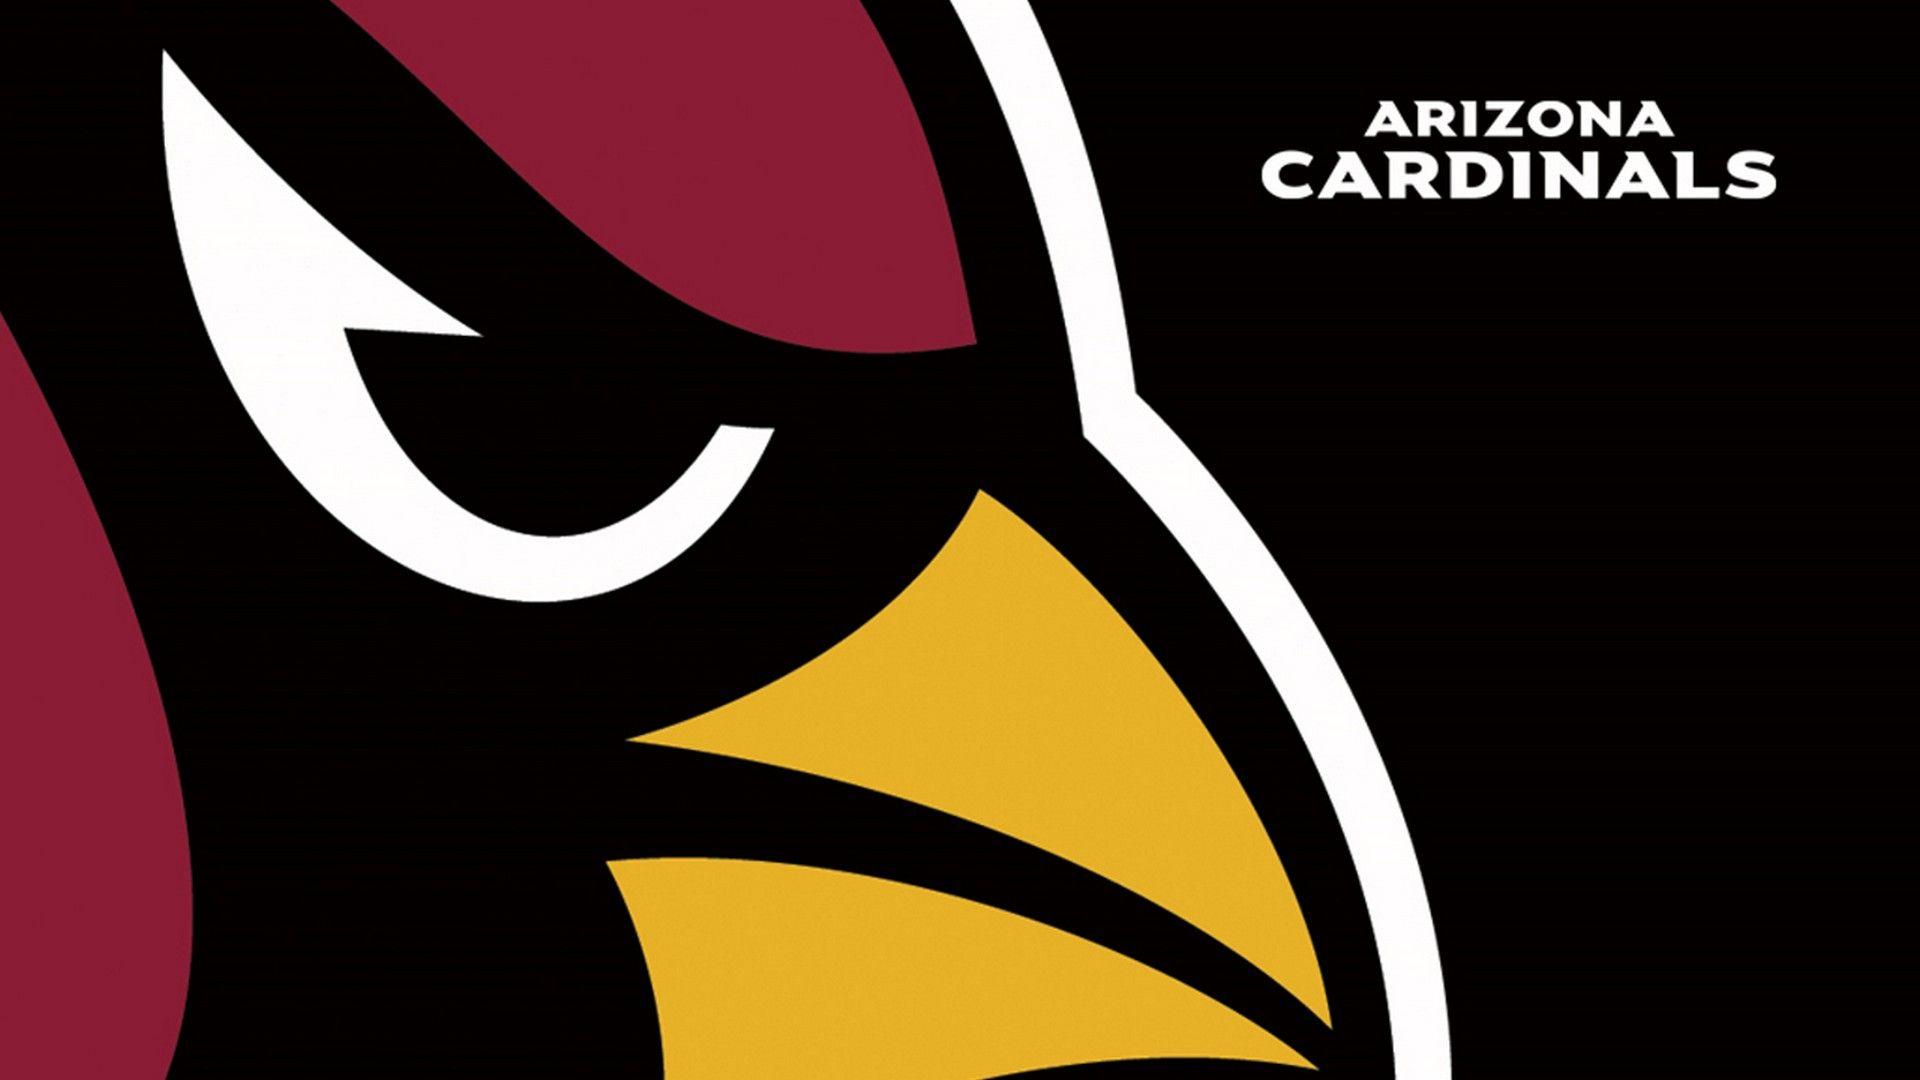 c9838a38 HD Desktop Wallpaper Arizona Cardinals | Wallpapers | Arizona ...